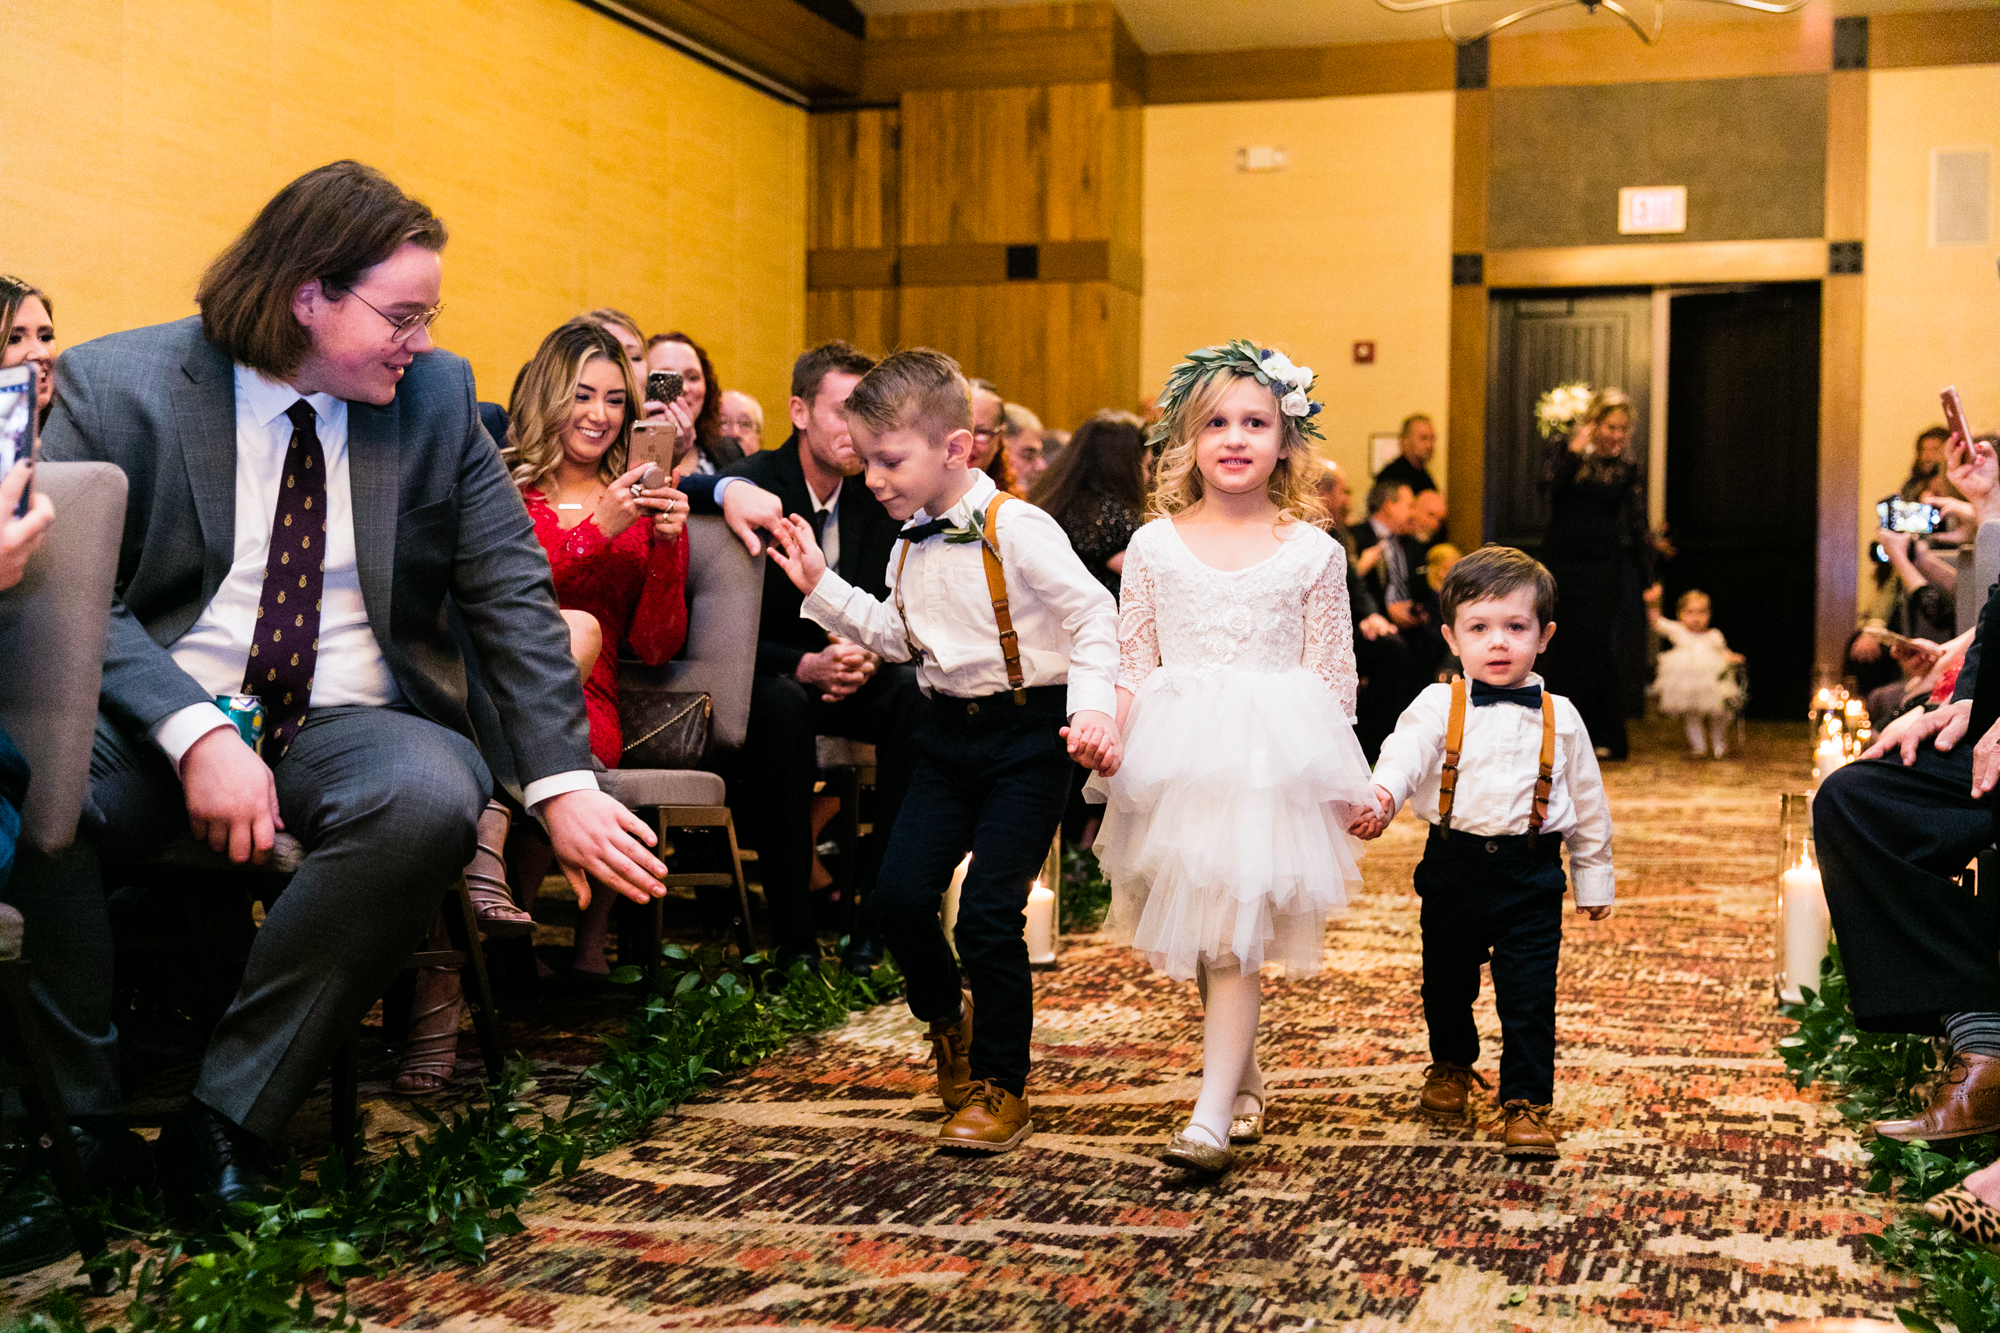 Bear Creek Mountain Resort Wedding Photography - Lovestruck Pictures-063.jpg